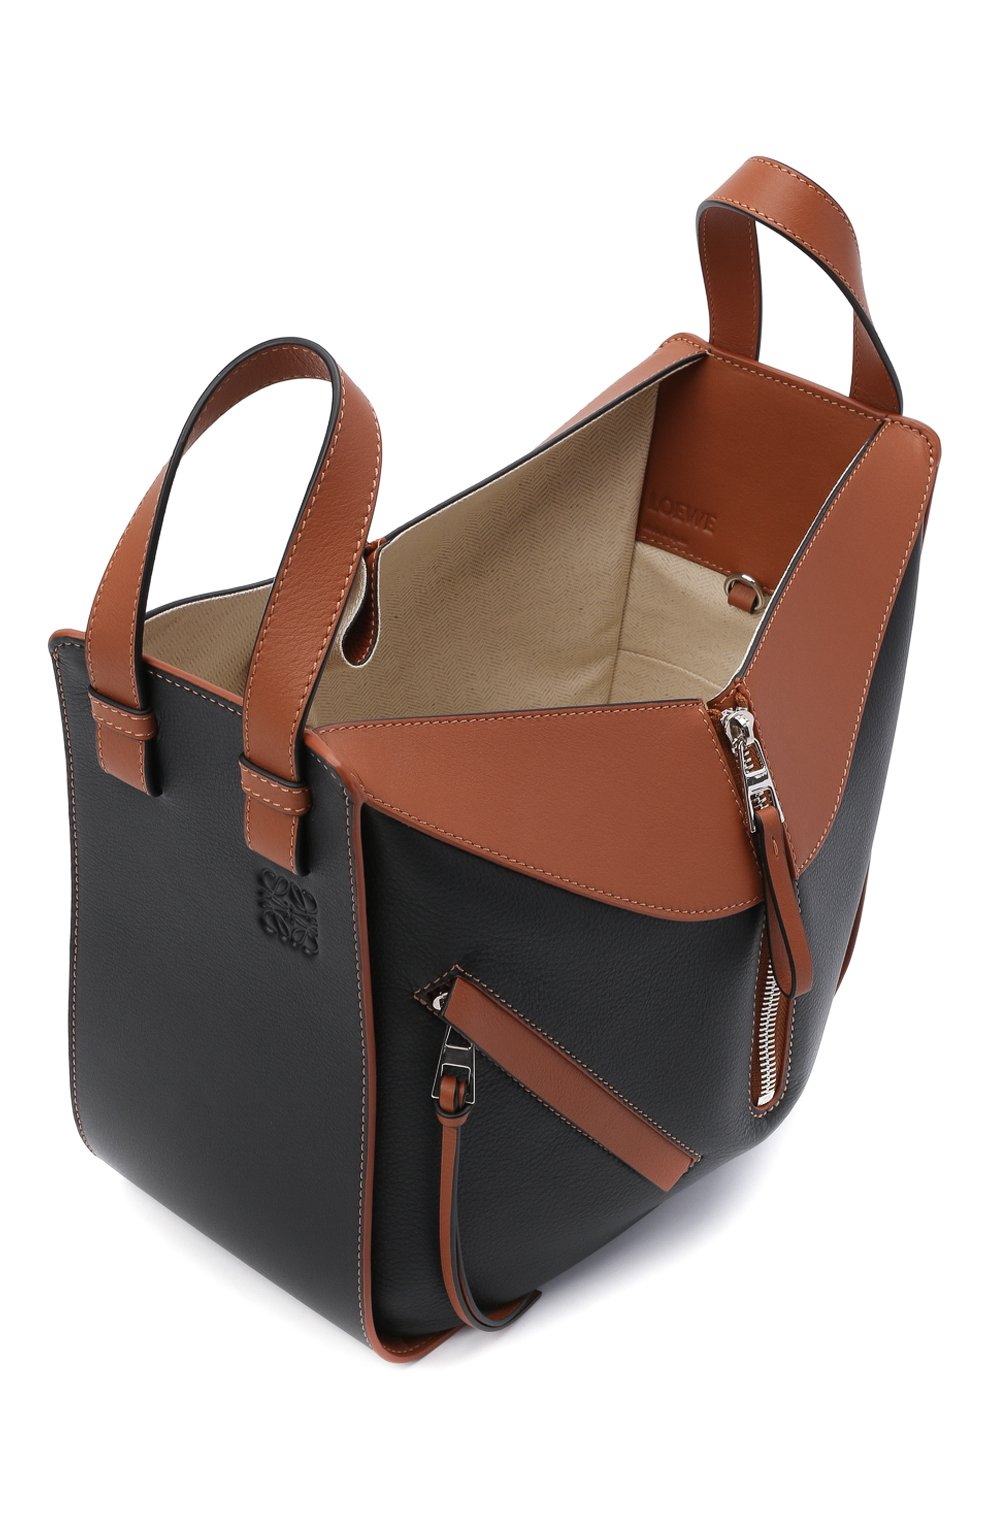 Женская сумка hammock small LOEWE черного цвета, арт. A538S35X04   Фото 4 (Сумки-технические: Сумки через плечо, Сумки top-handle; Материал: Натуральная кожа; Ремень/цепочка: На ремешке; Размер: small)